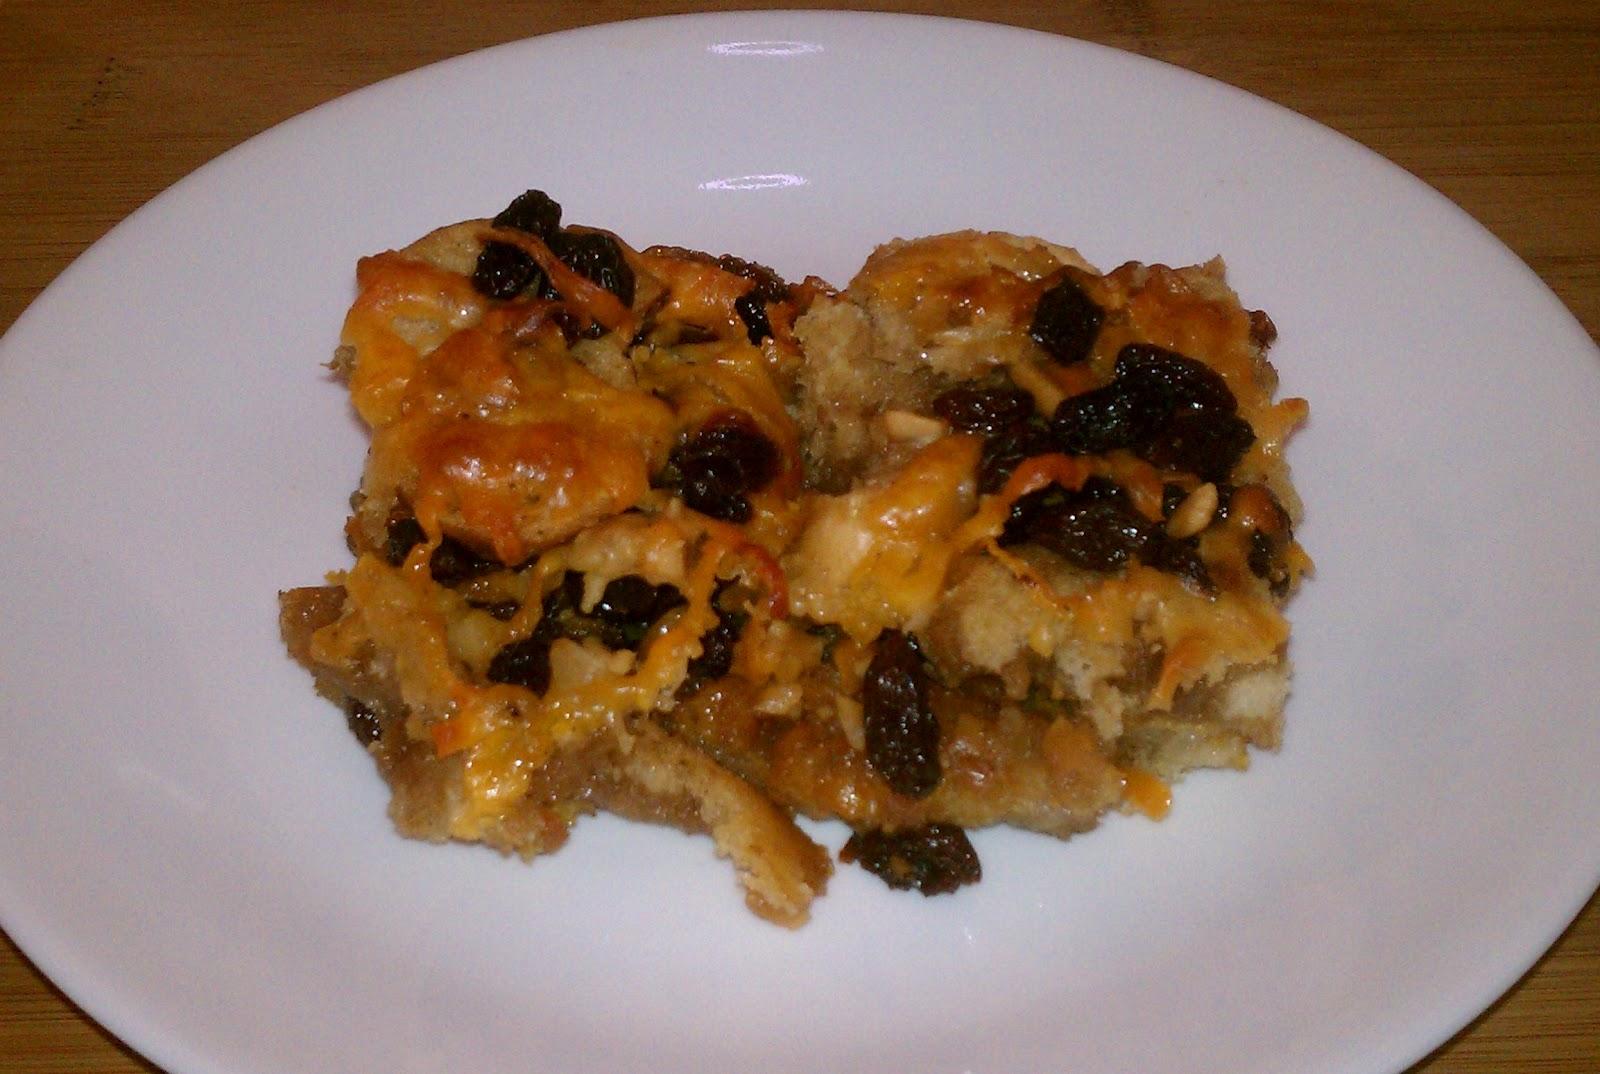 Texas Cookin' at Home: Capirotada